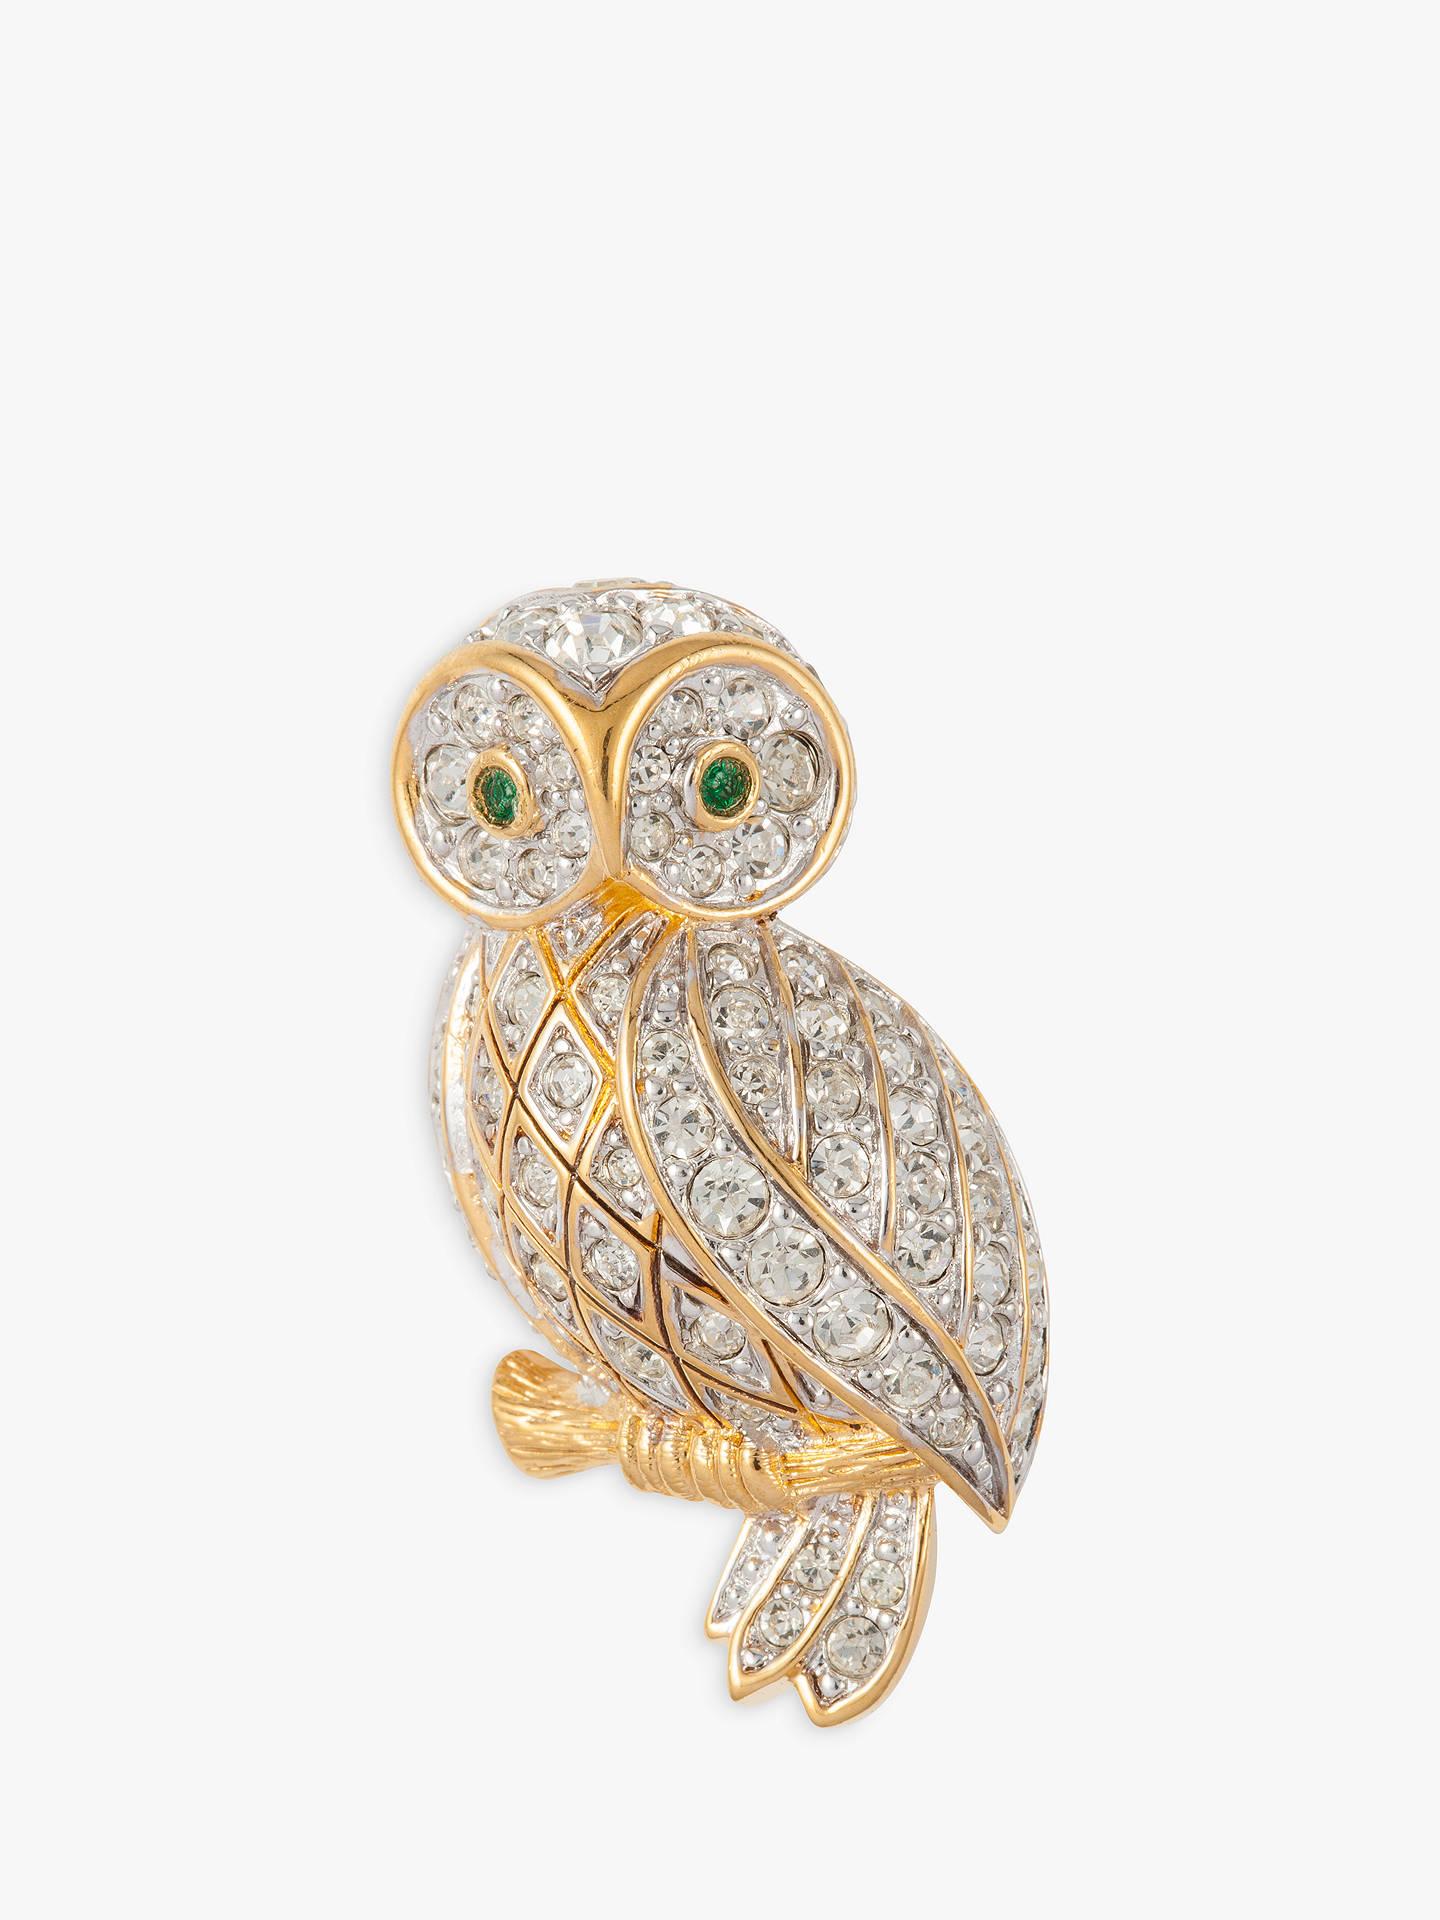 a7a7e327cd2 Buy Susan Caplan Vintage D'Orlan 22ct Gold Plated Swarovski Crystal Owl  Brooch, Gold ...